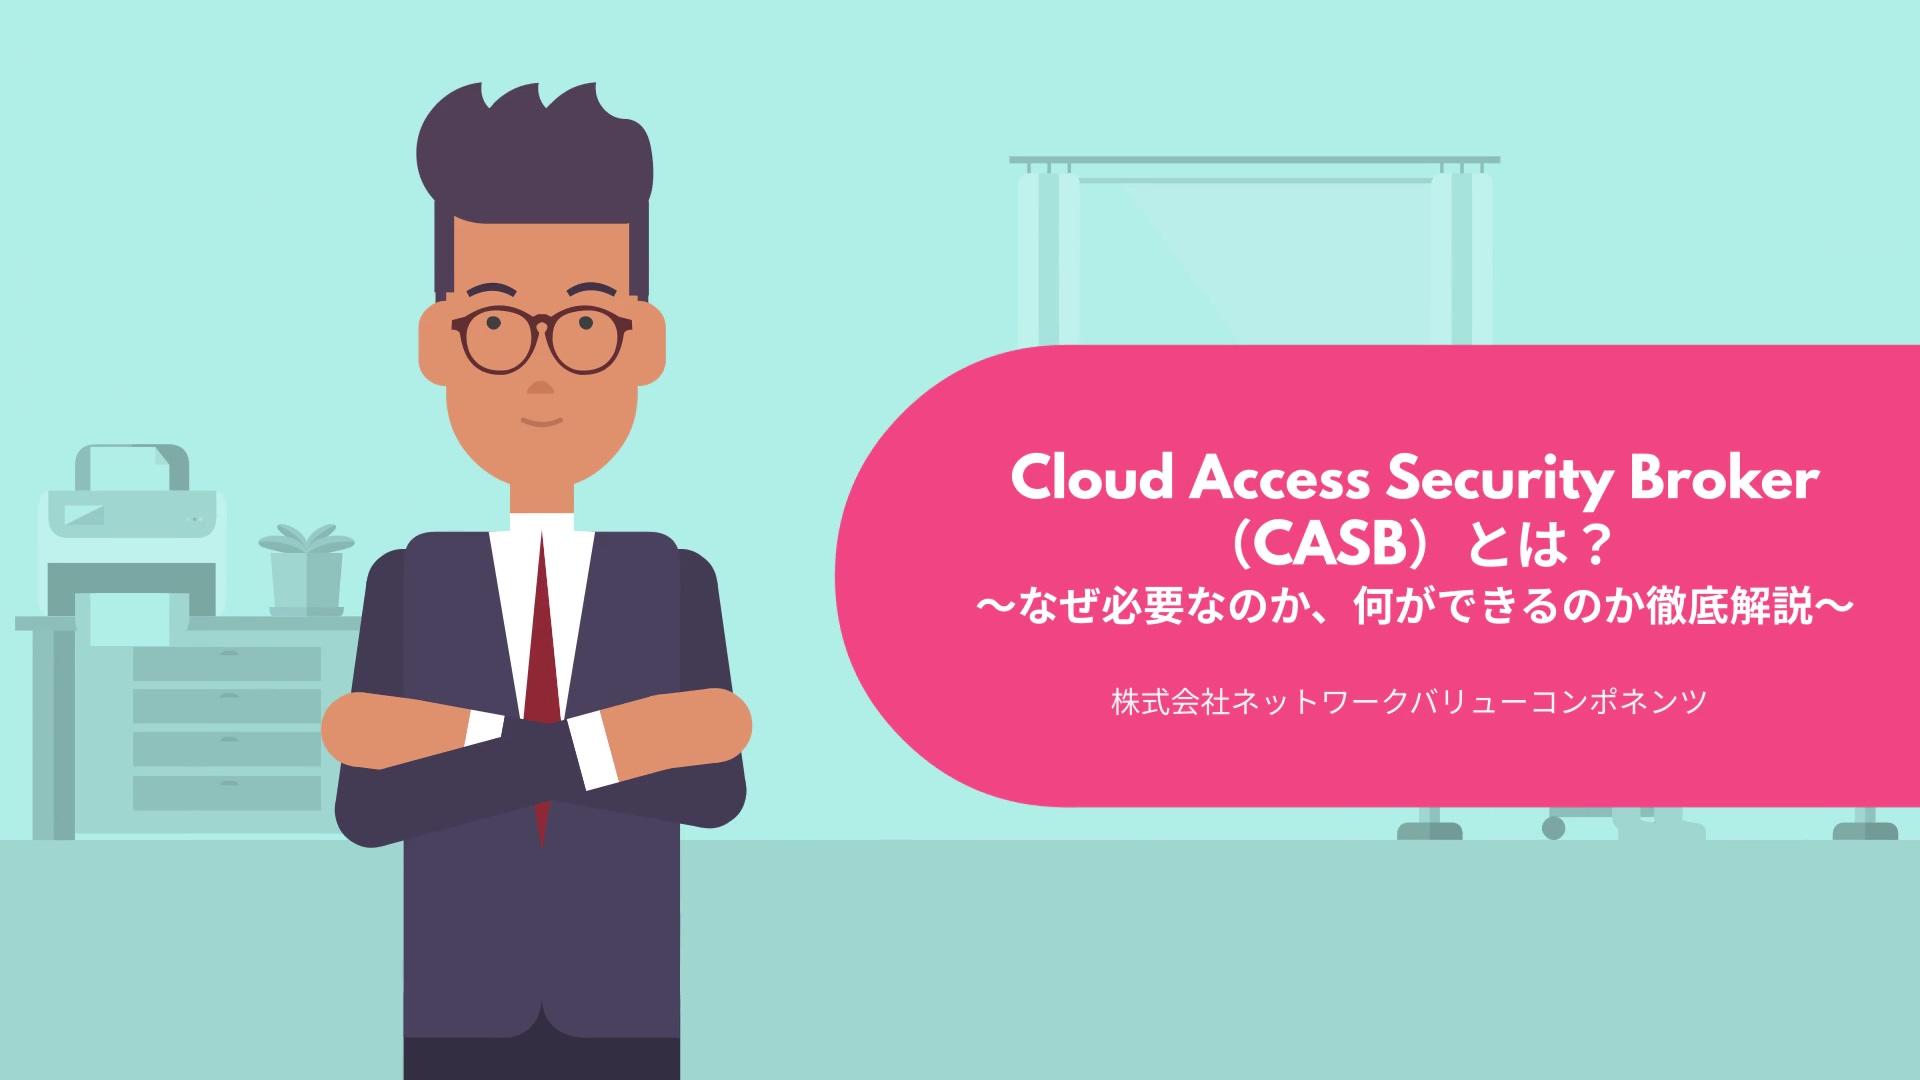 Cloud Access Security Broker(CASB)とは?~なぜ必要なのか、何ができるのか徹底解説~